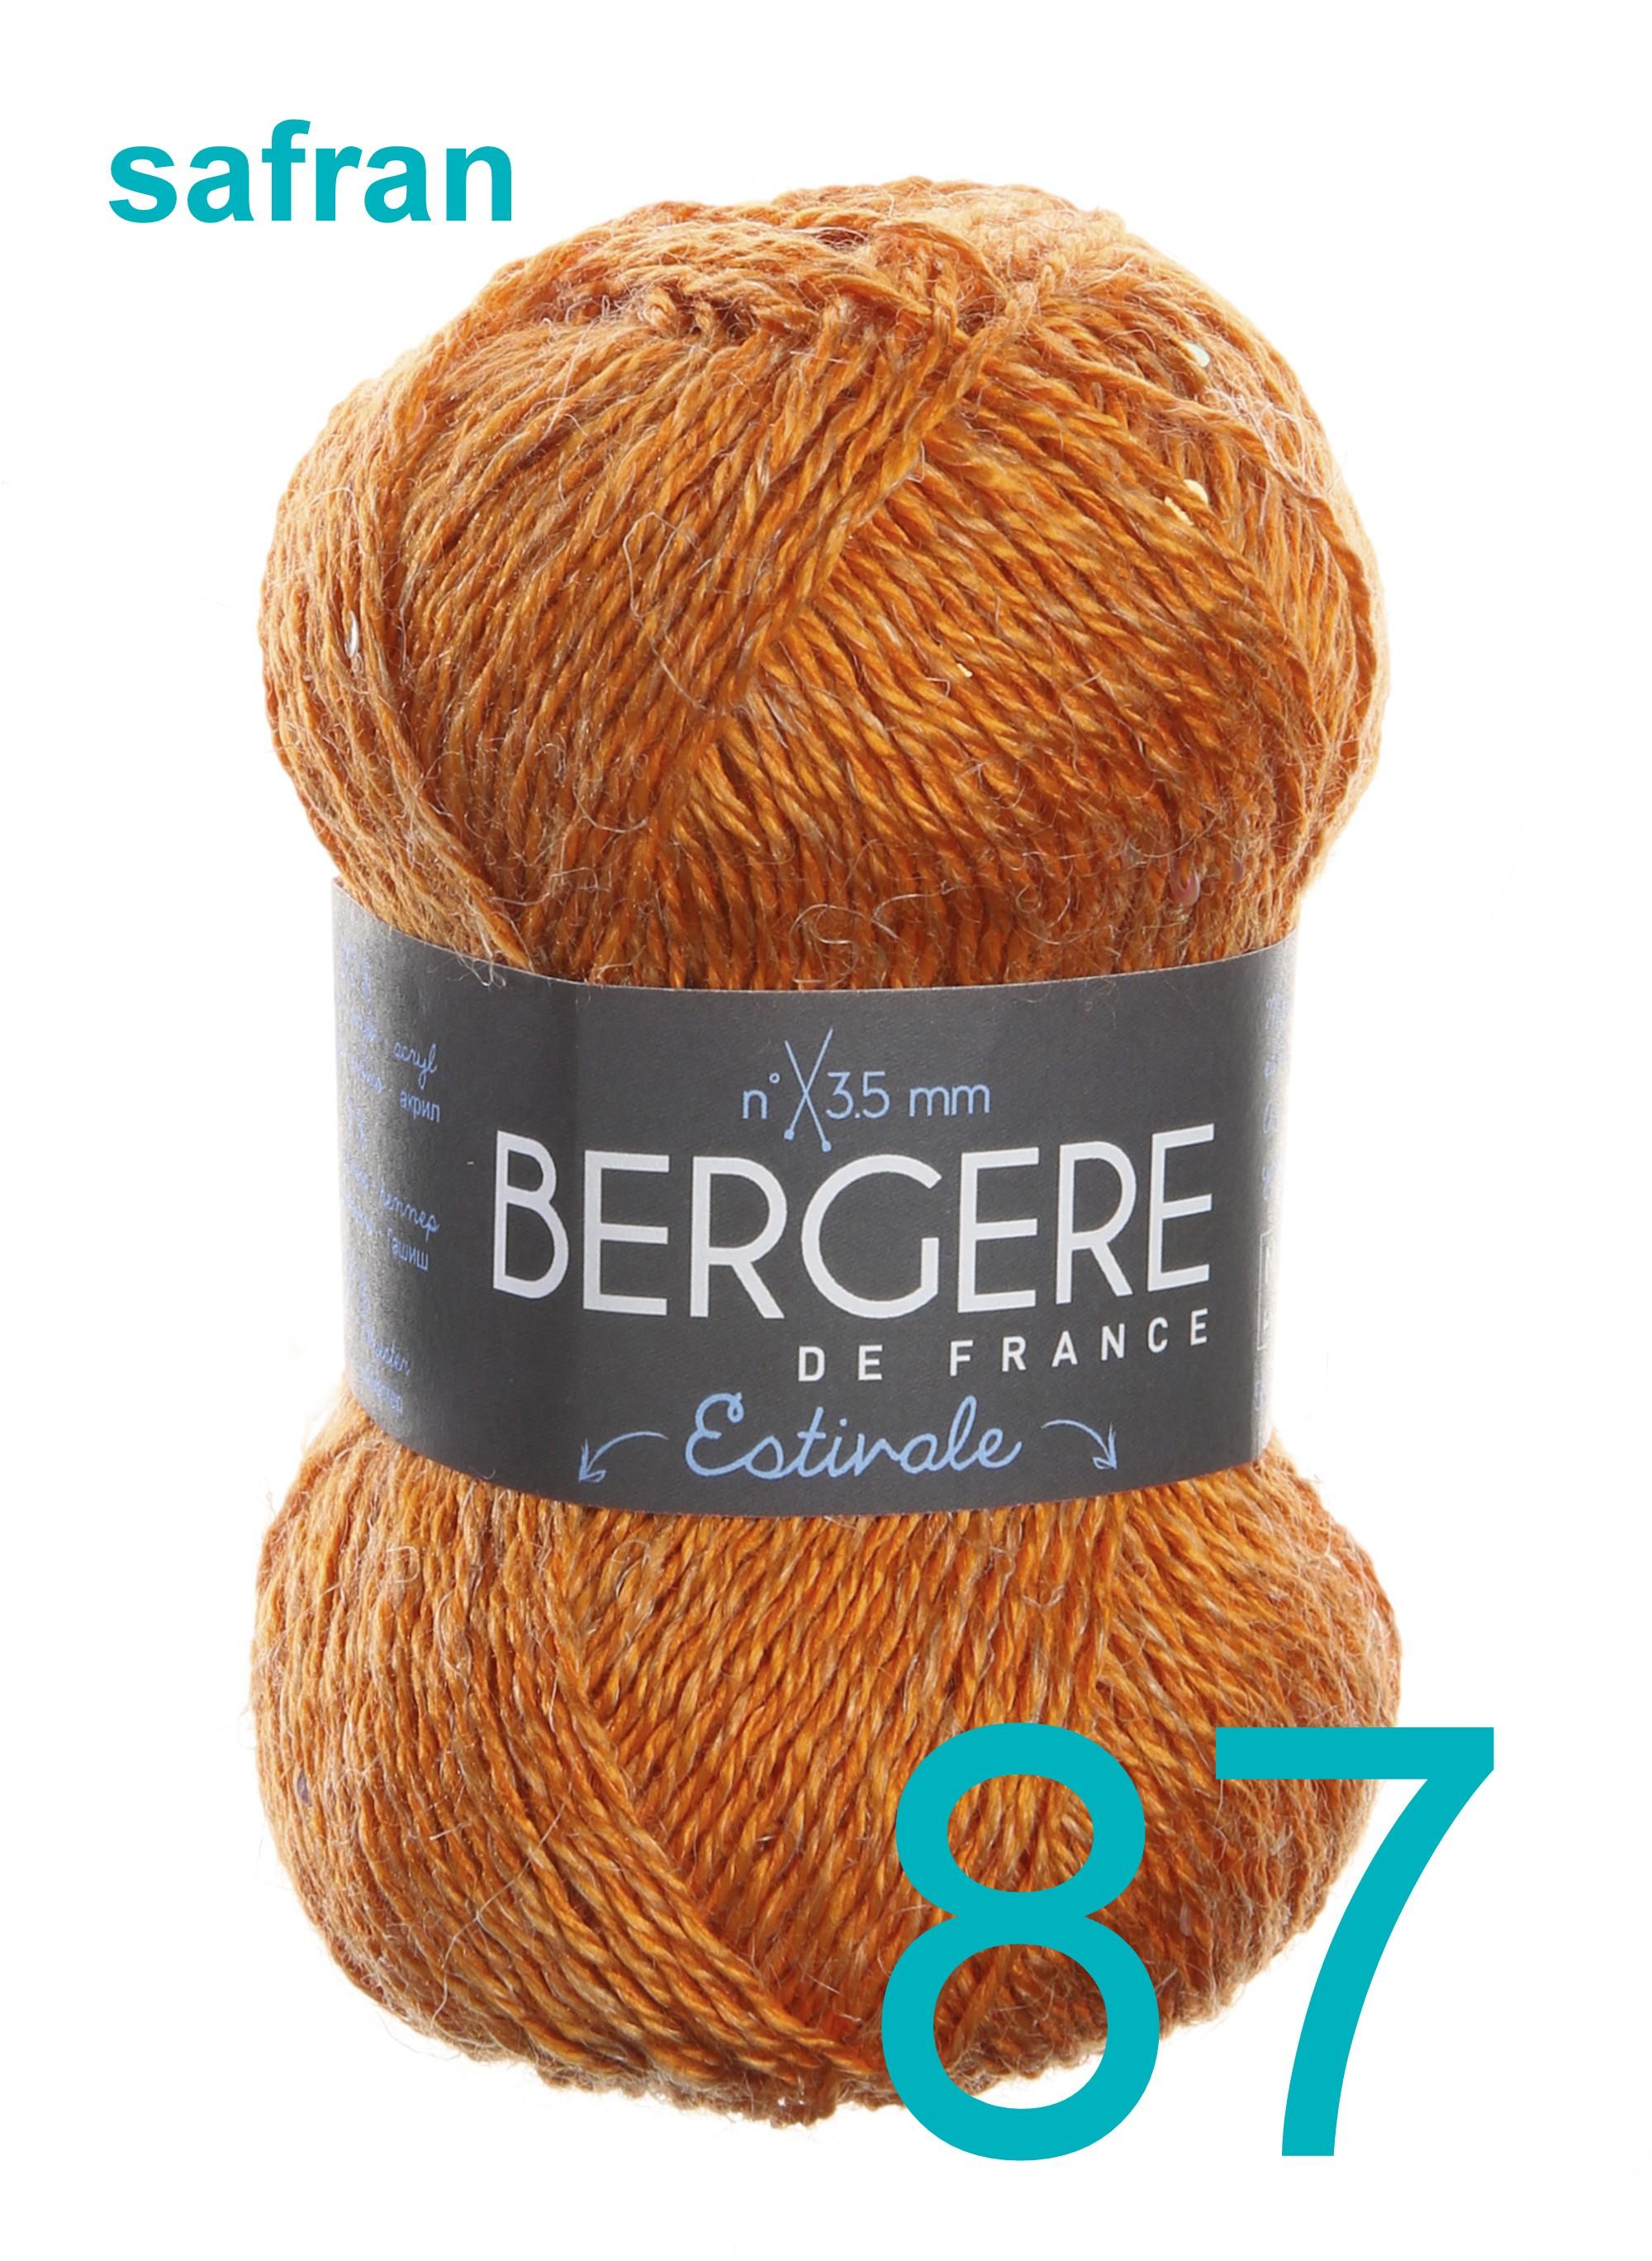 Bergere Ecoton safran 87